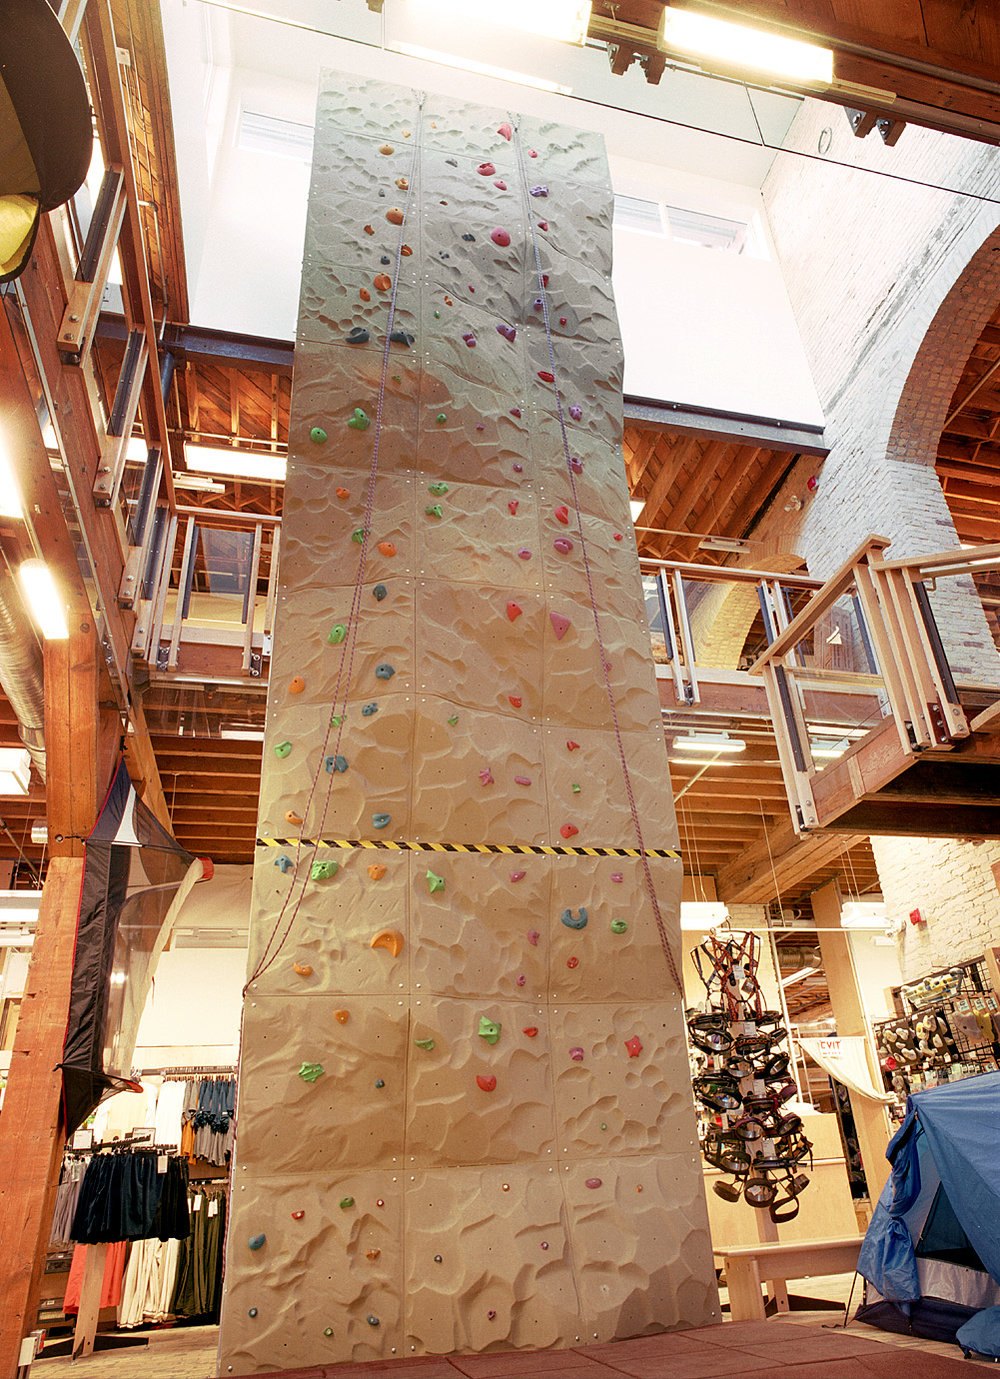 Mountain Equipment Co-op Winnipeg, interior photo of climbing wall / Photo: Gerry Kopelow